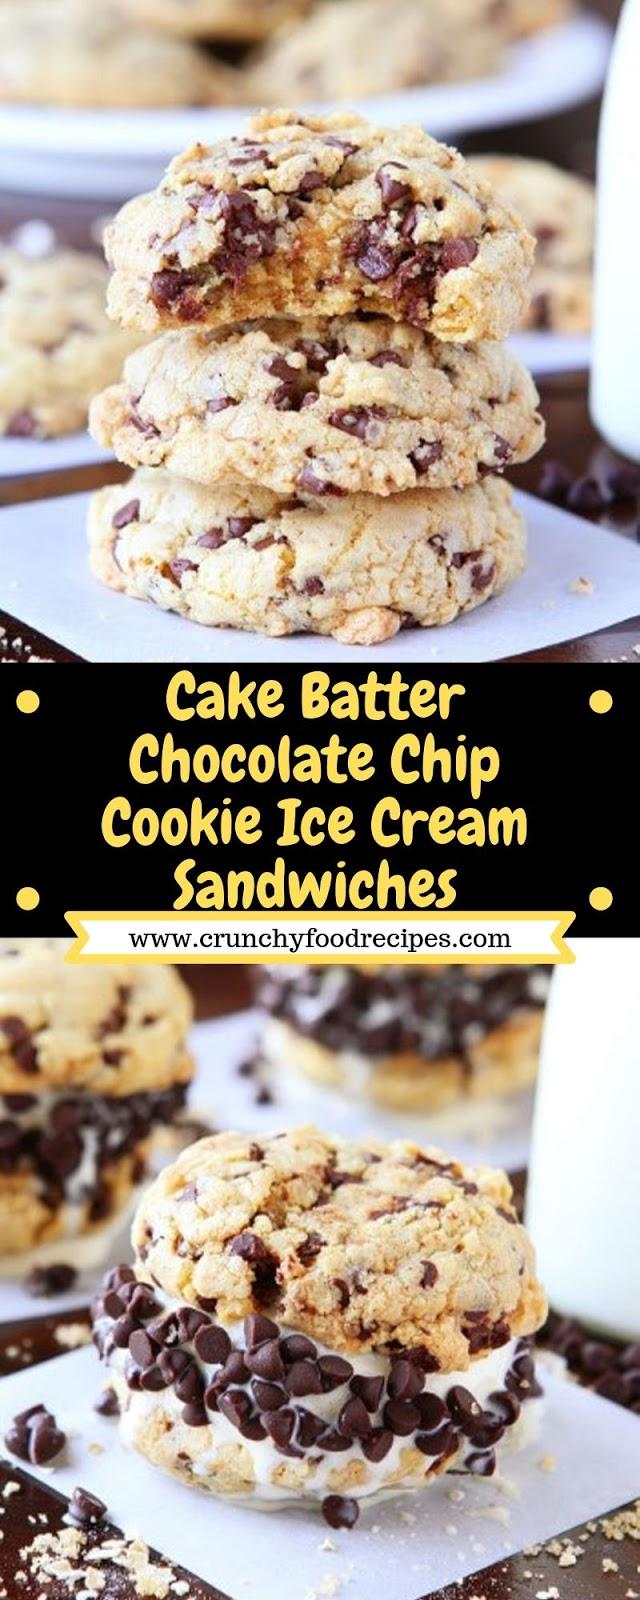 Cake Batter Chocolate Chip Cookie Ice Cream Sandwiches